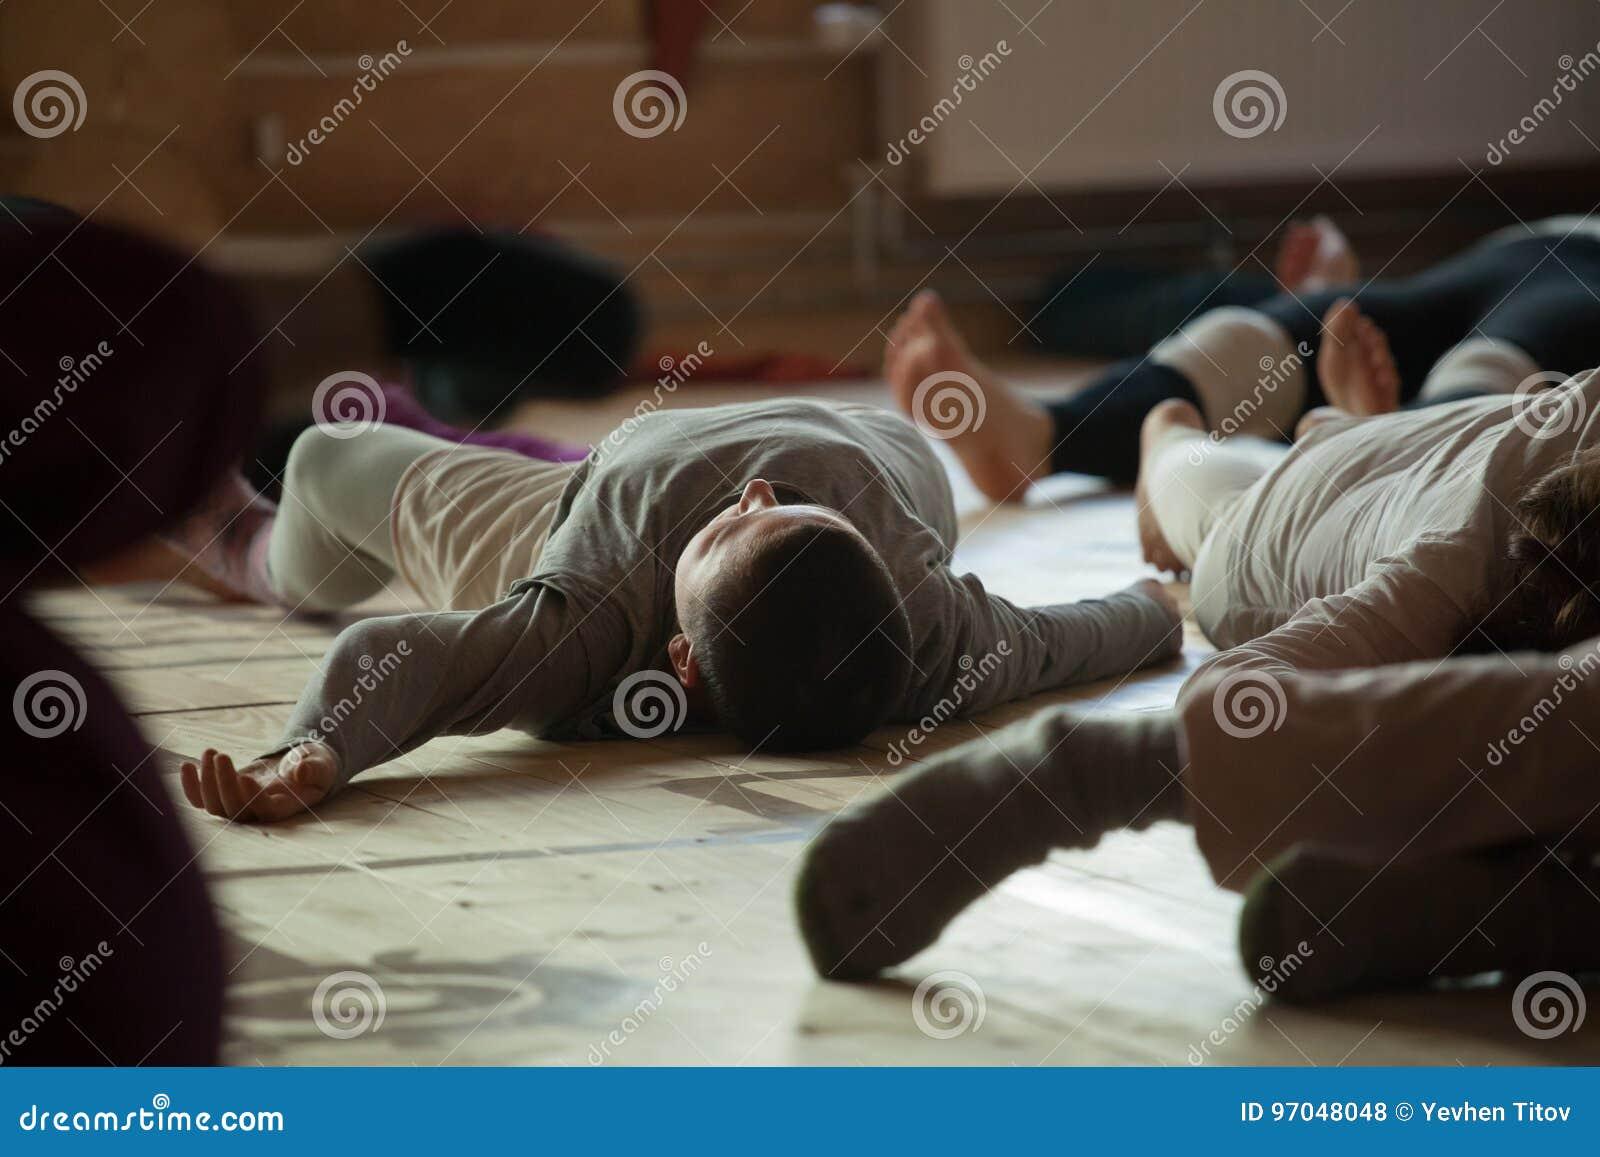 Dansare foots, ben, på golv